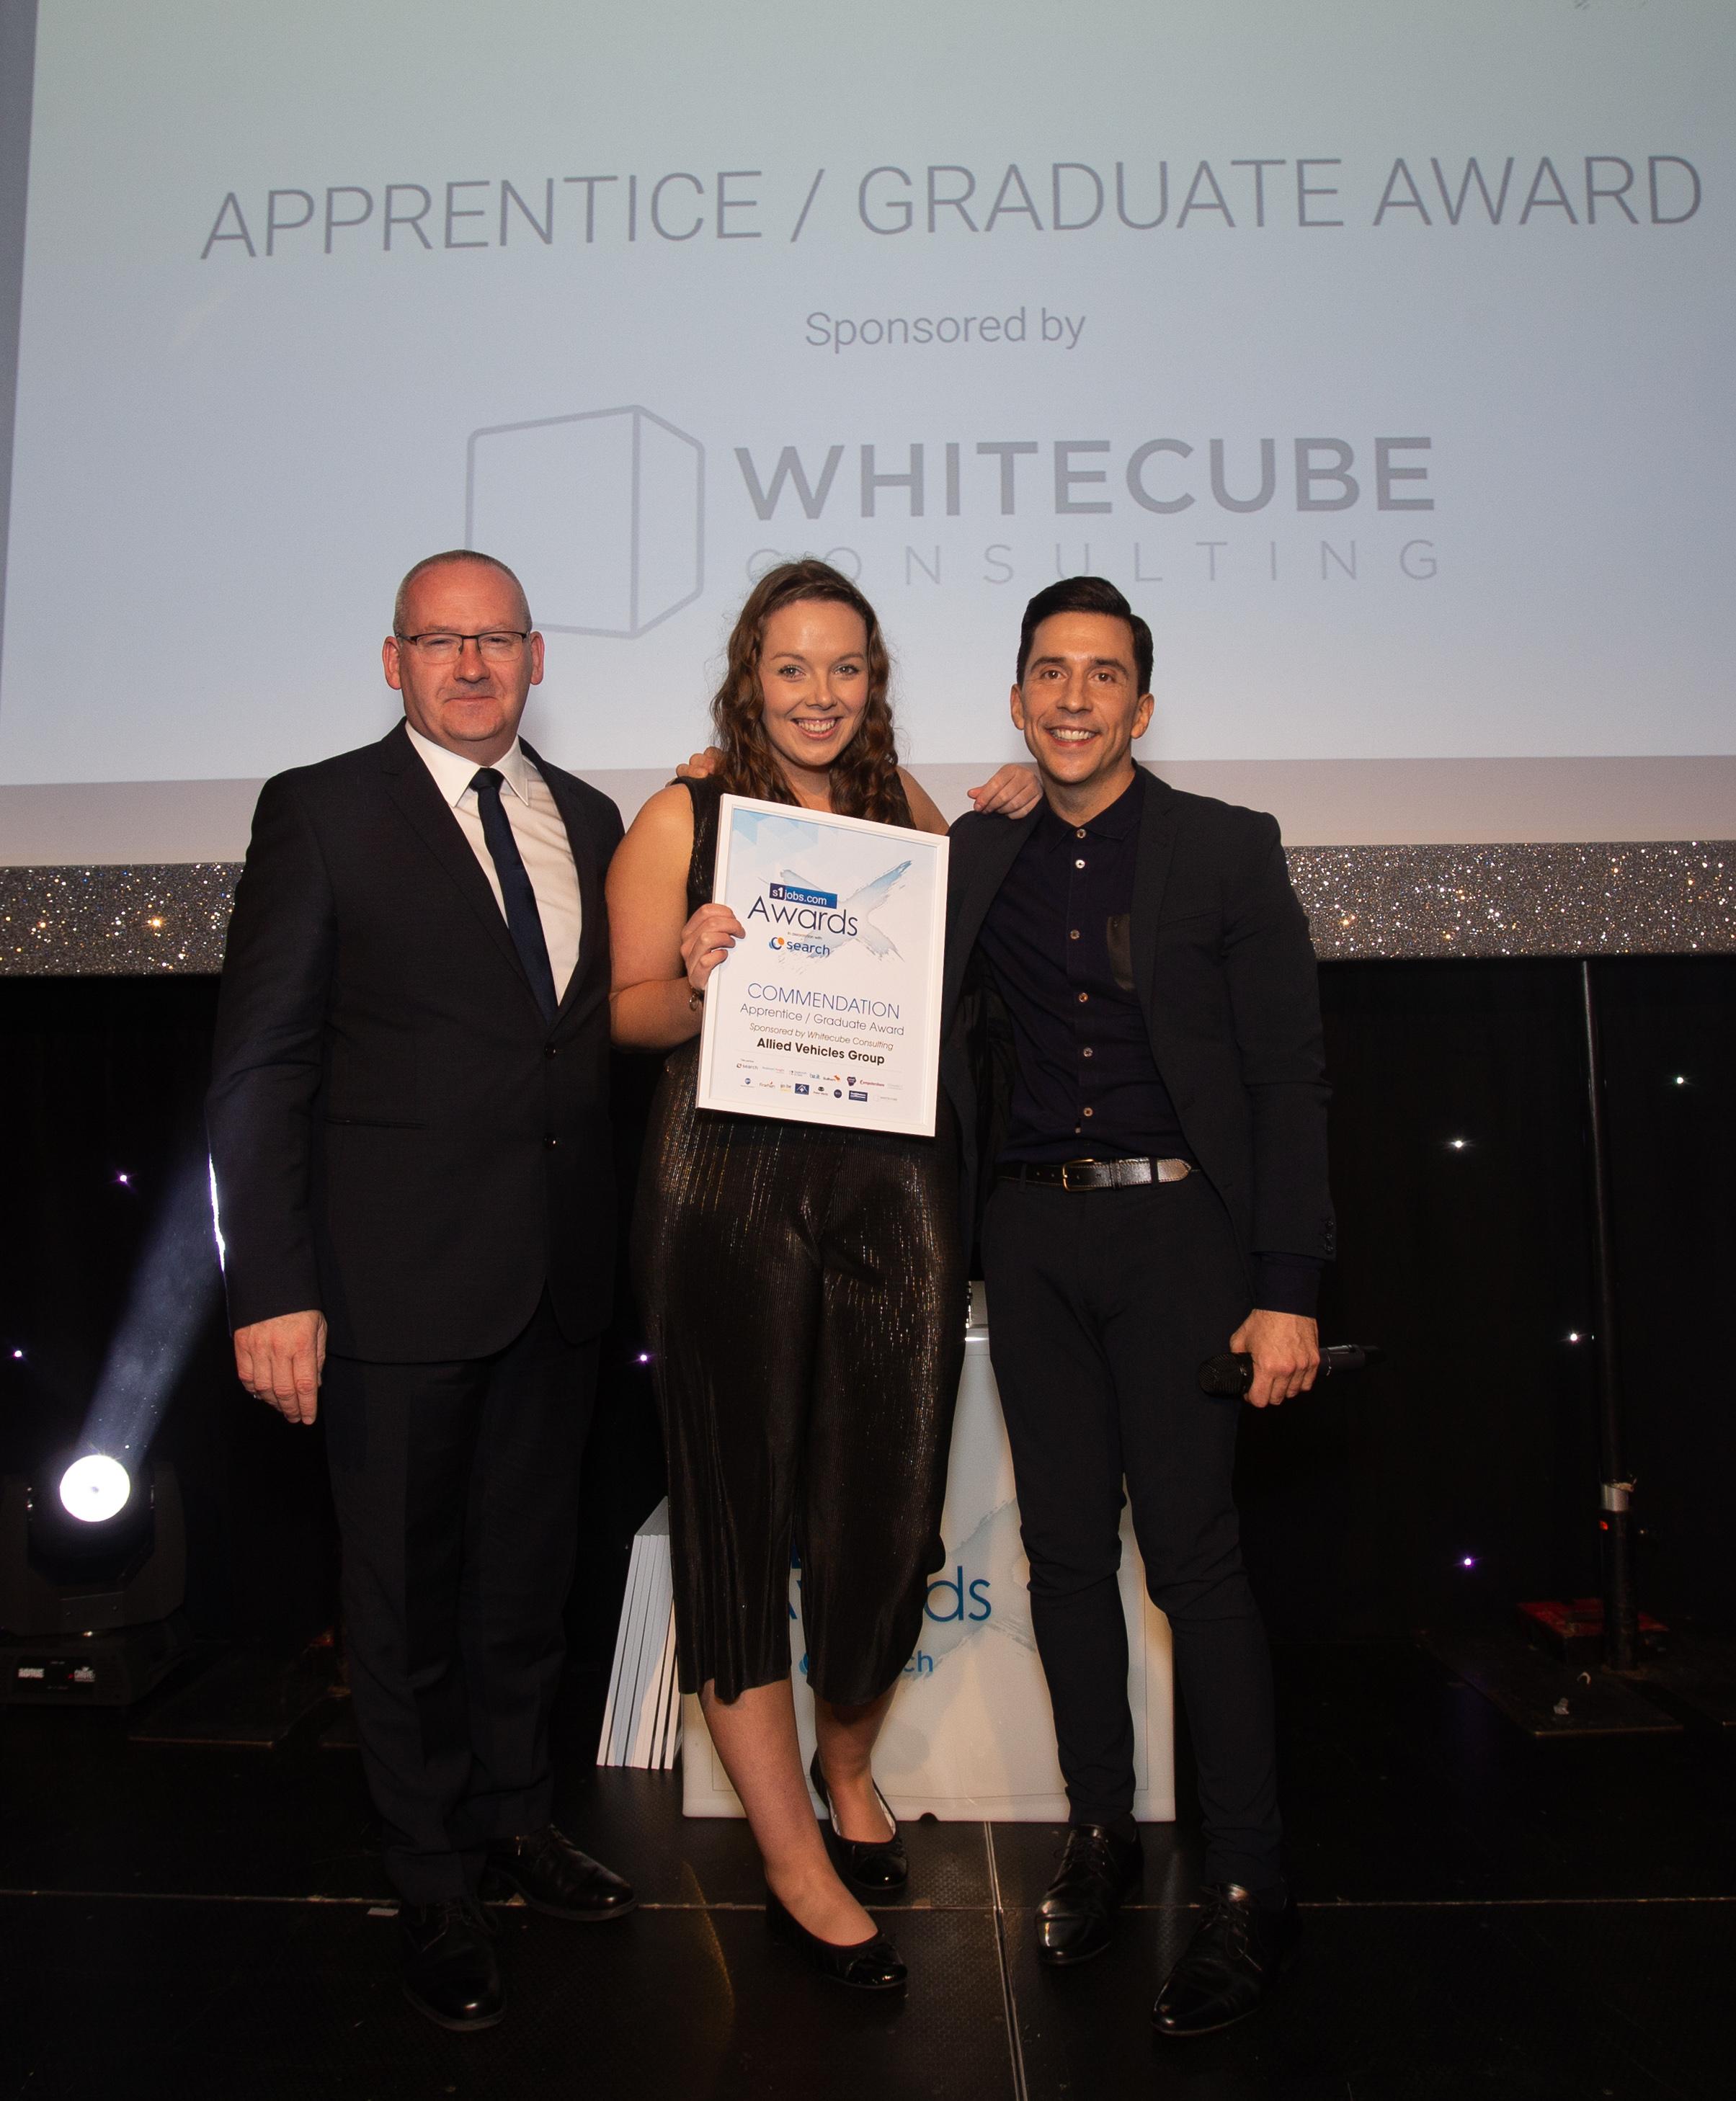 s1jobs Recruitment Awards MFG 0206